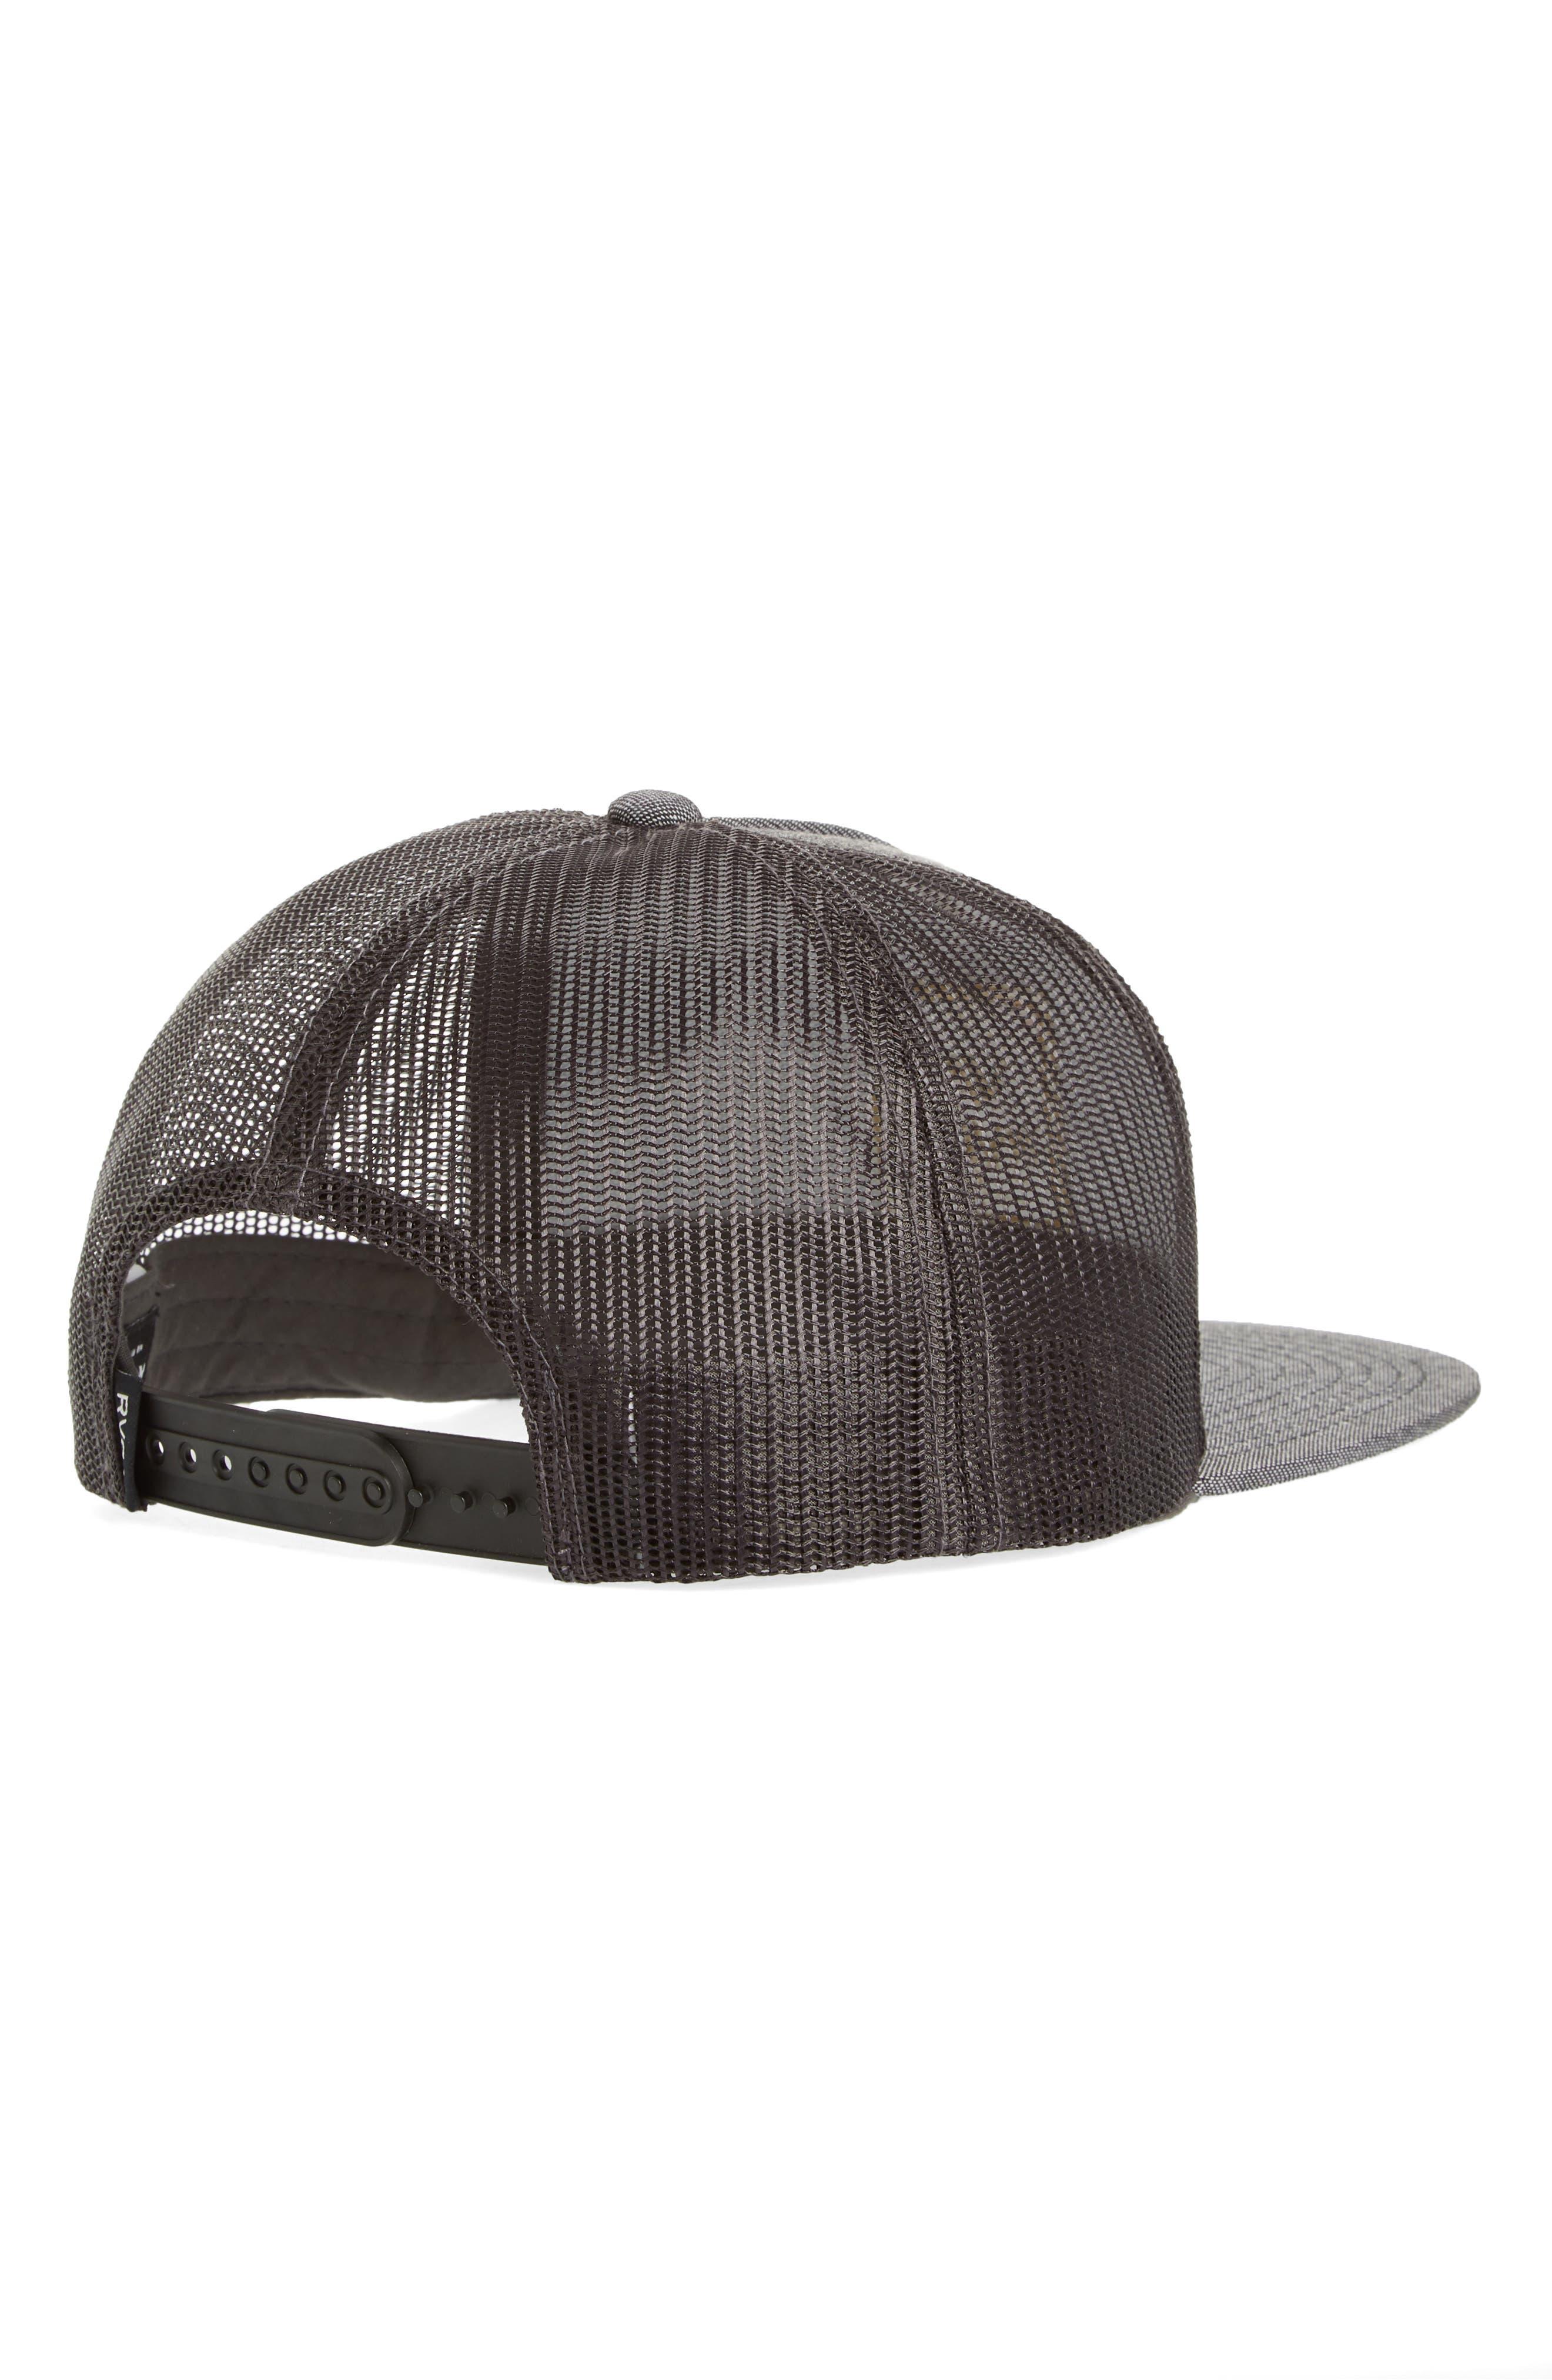 RVCA, VA All the Way Trucker Hat, Alternate thumbnail 2, color, DARK CHARCOAL HEATHER